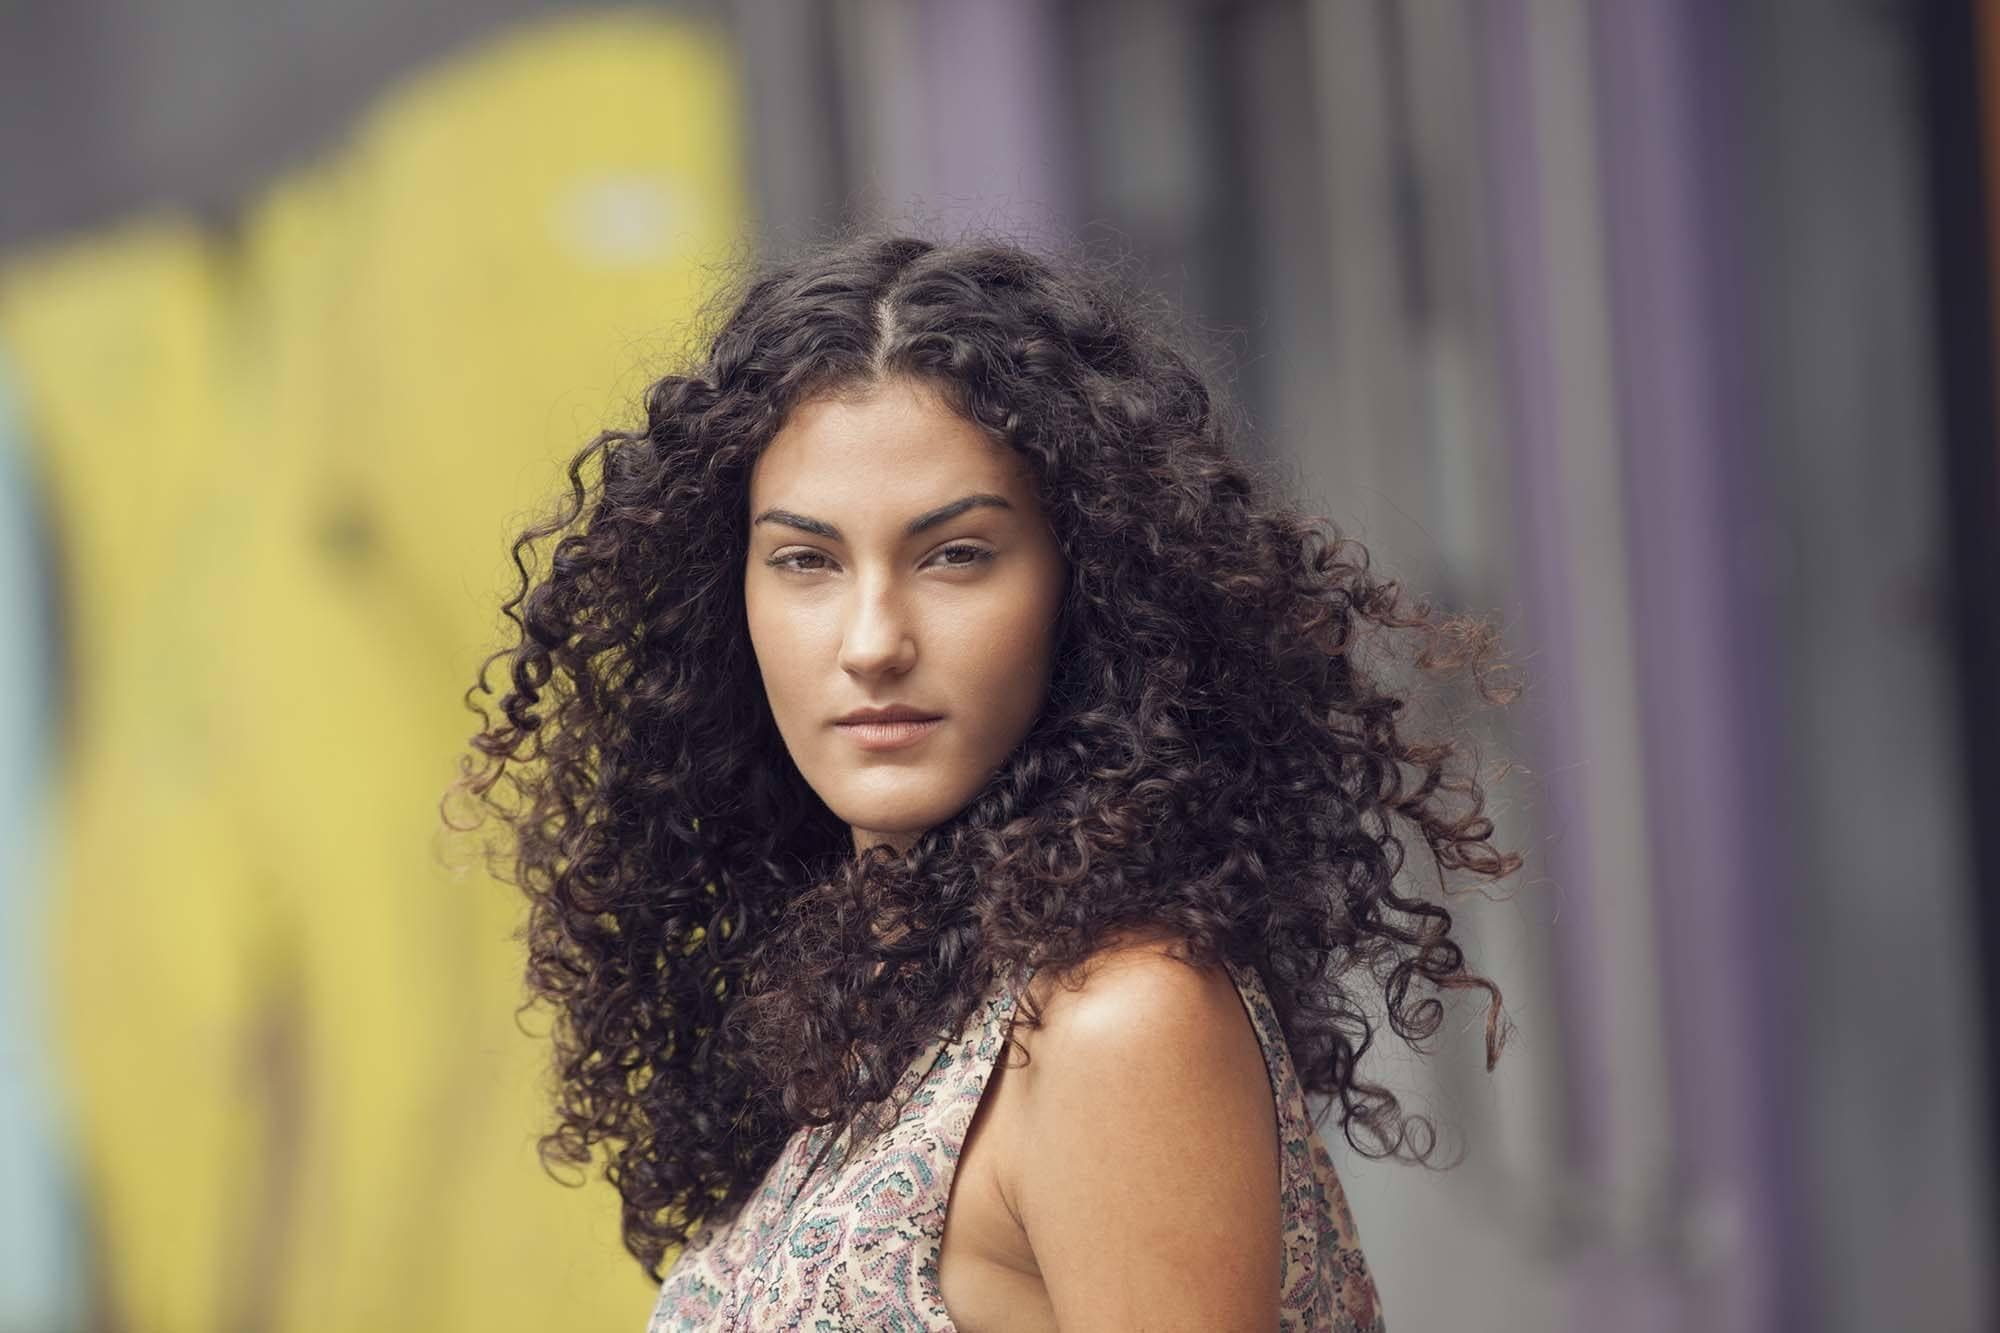 hair smoothing serum on curly hair